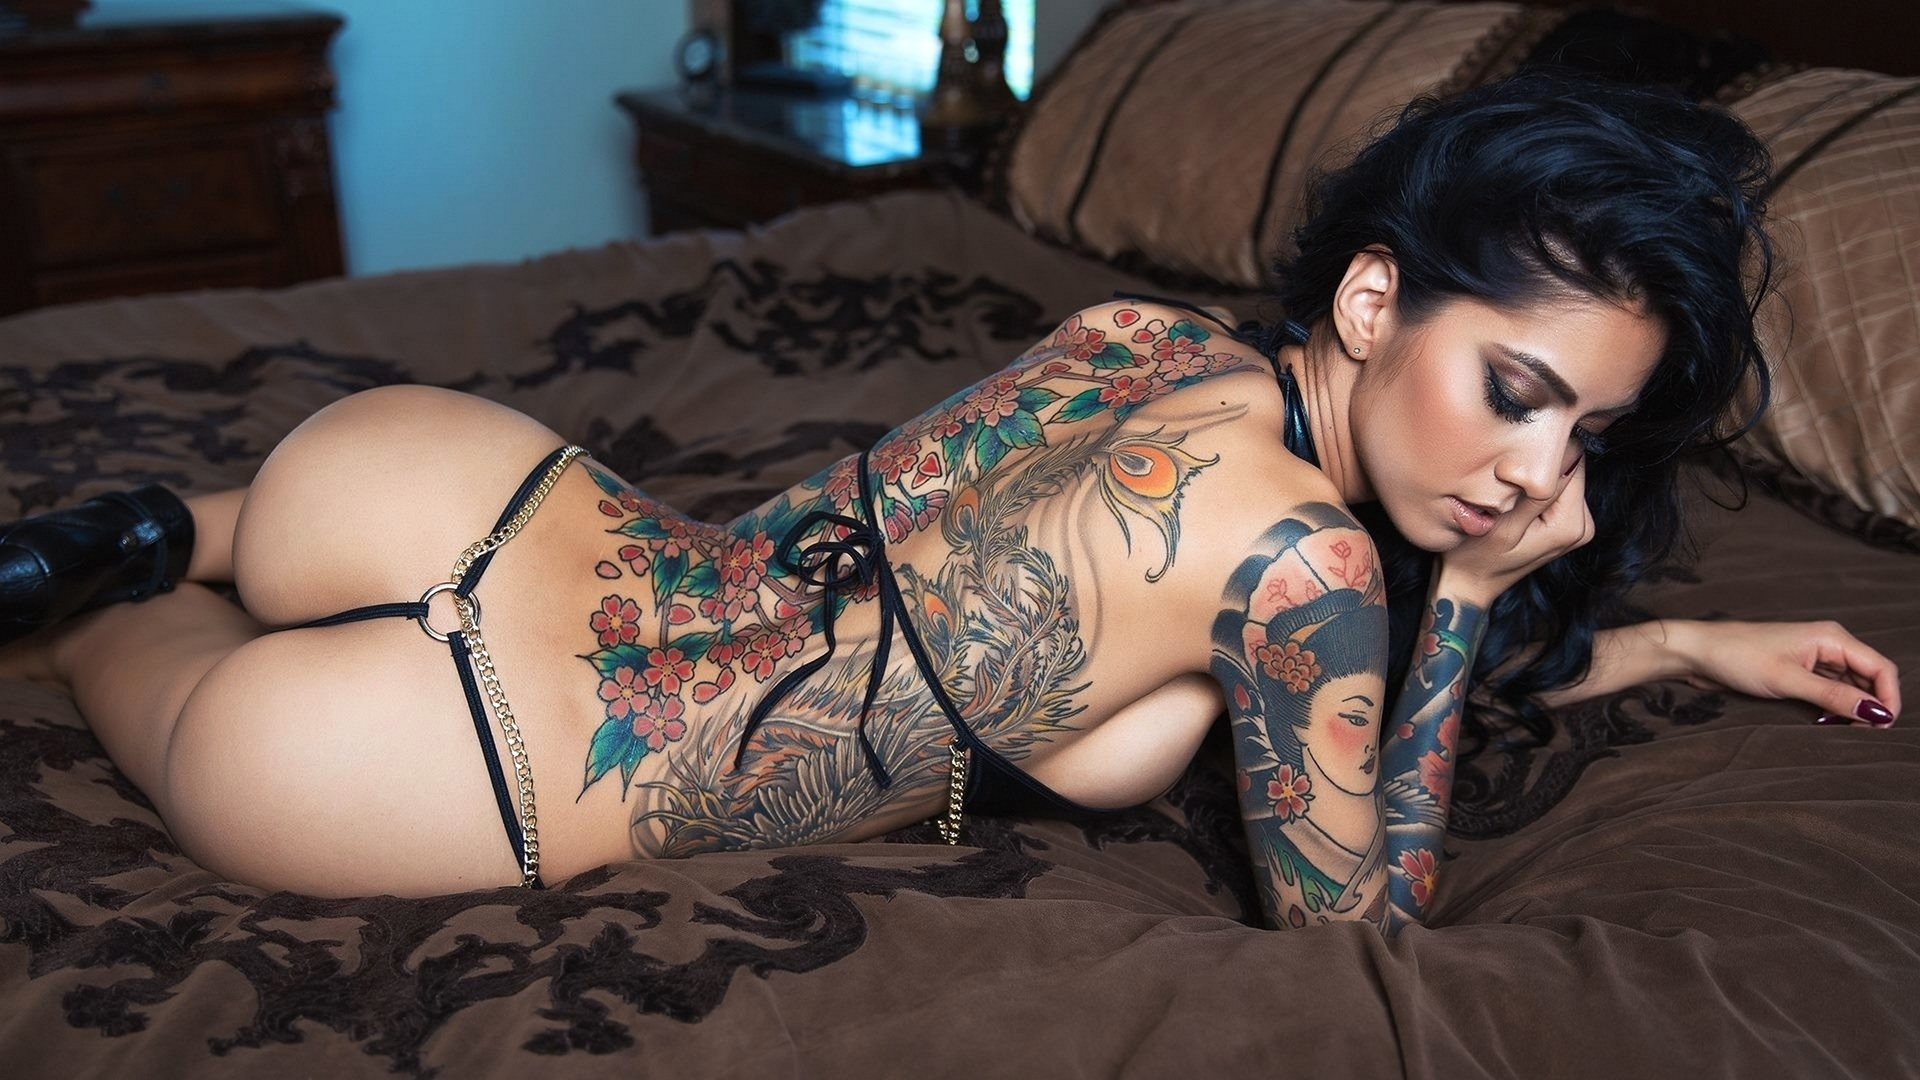 Tattoo girl nude pics booty training larvinmusic